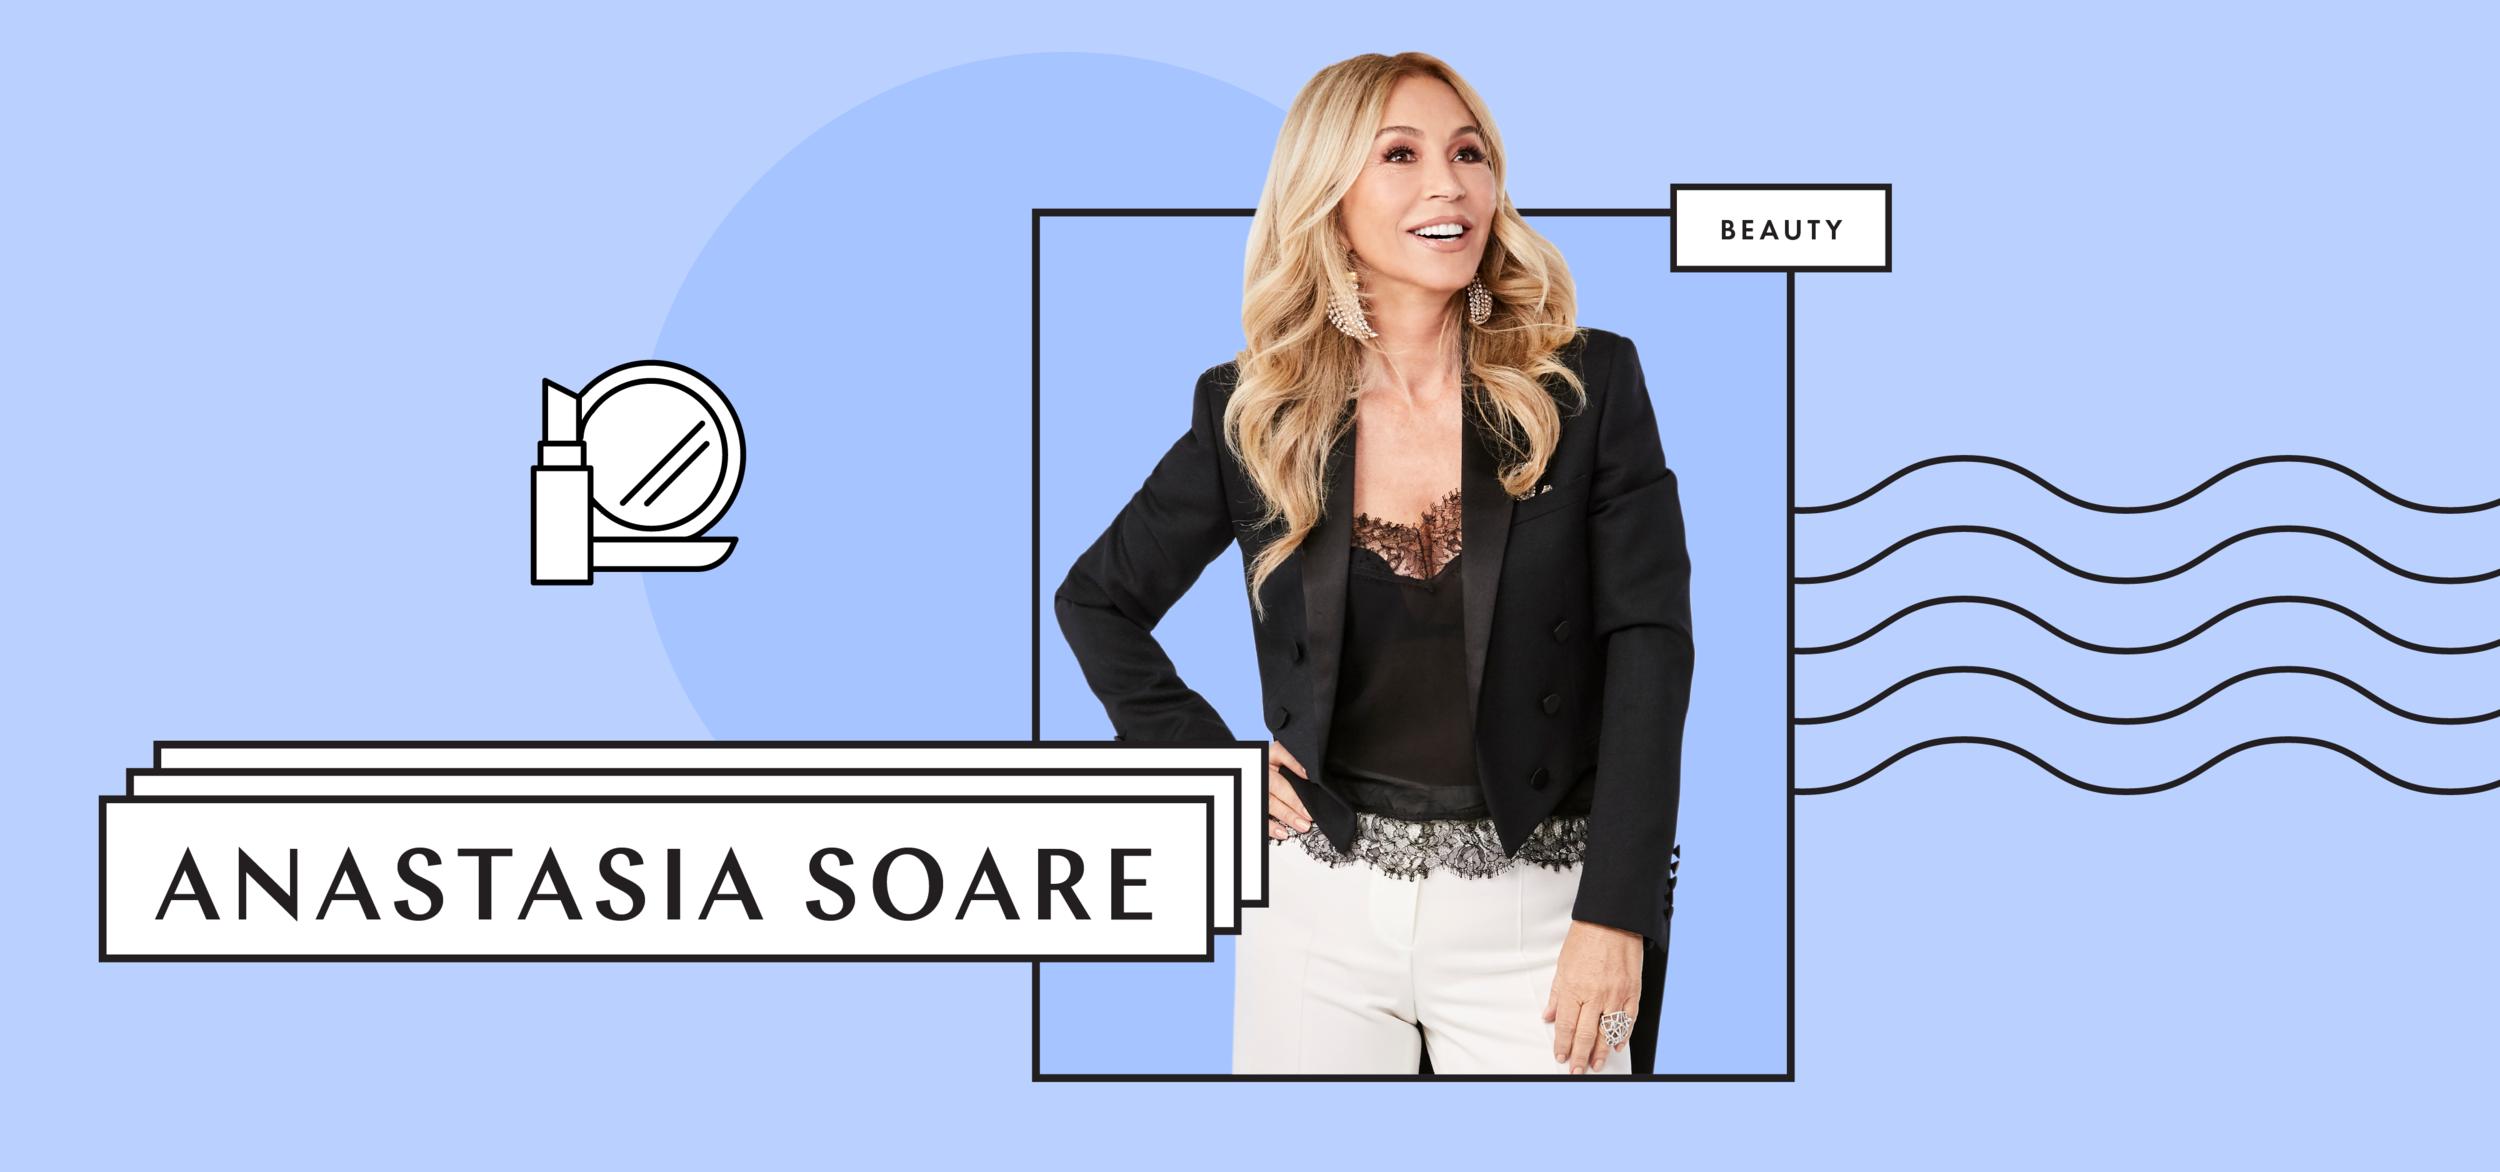 Anastasia Soare Create & Cultivate 100 banner